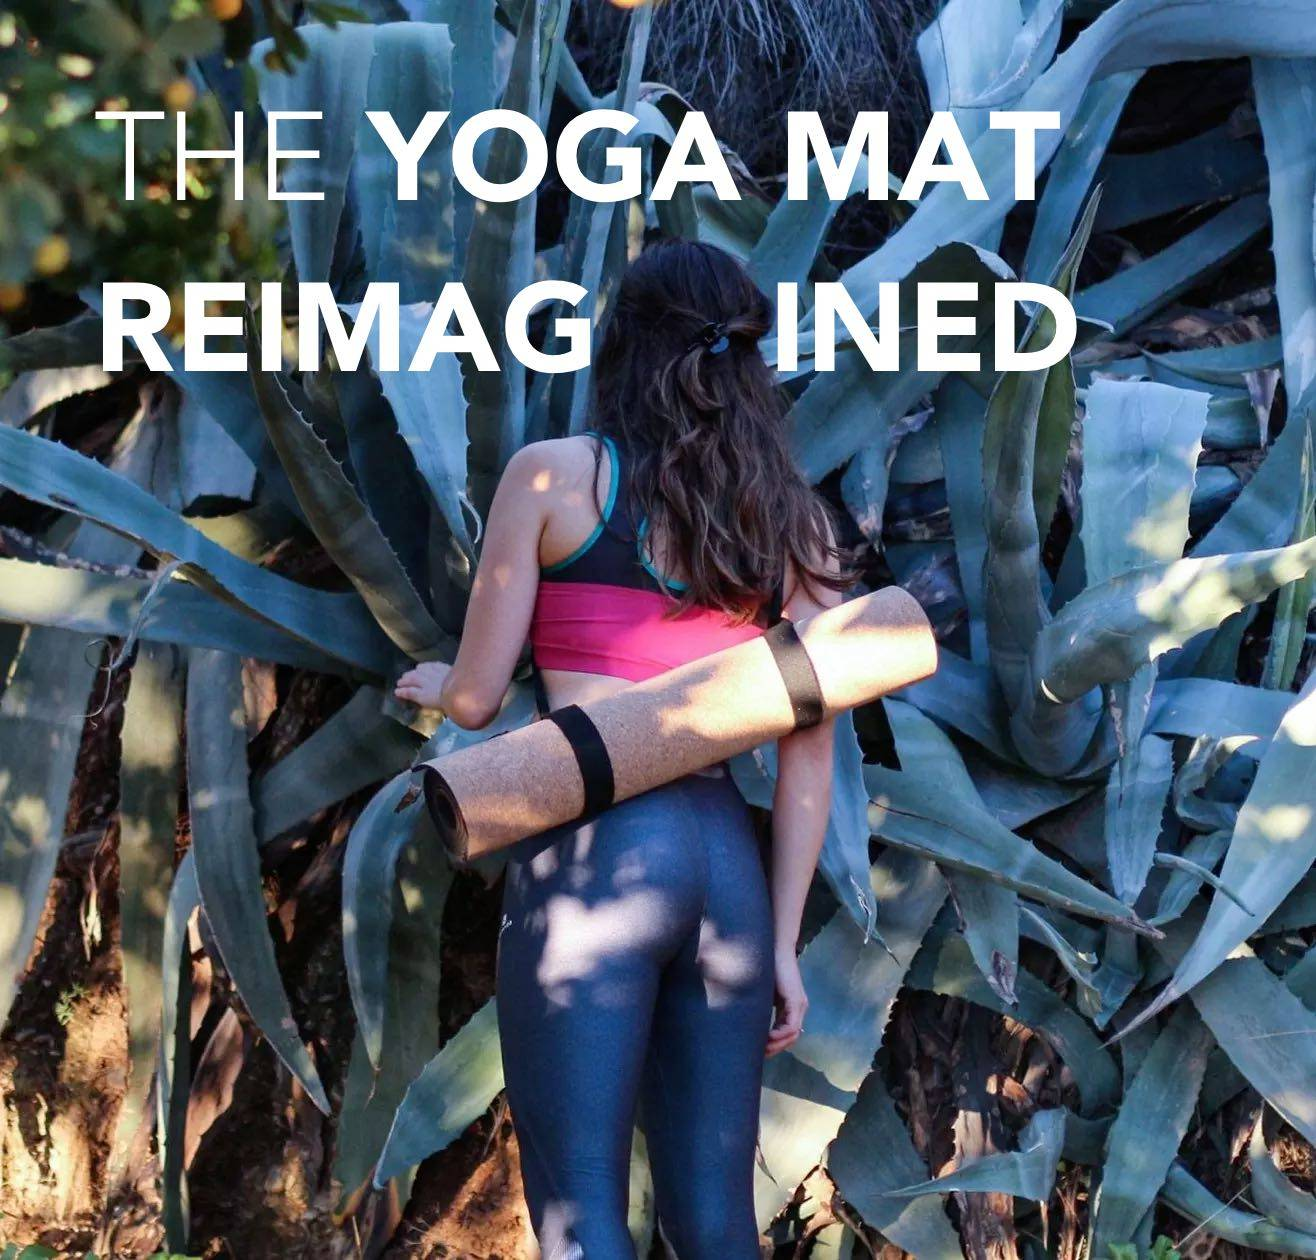 The Yoga Mat Reimagined